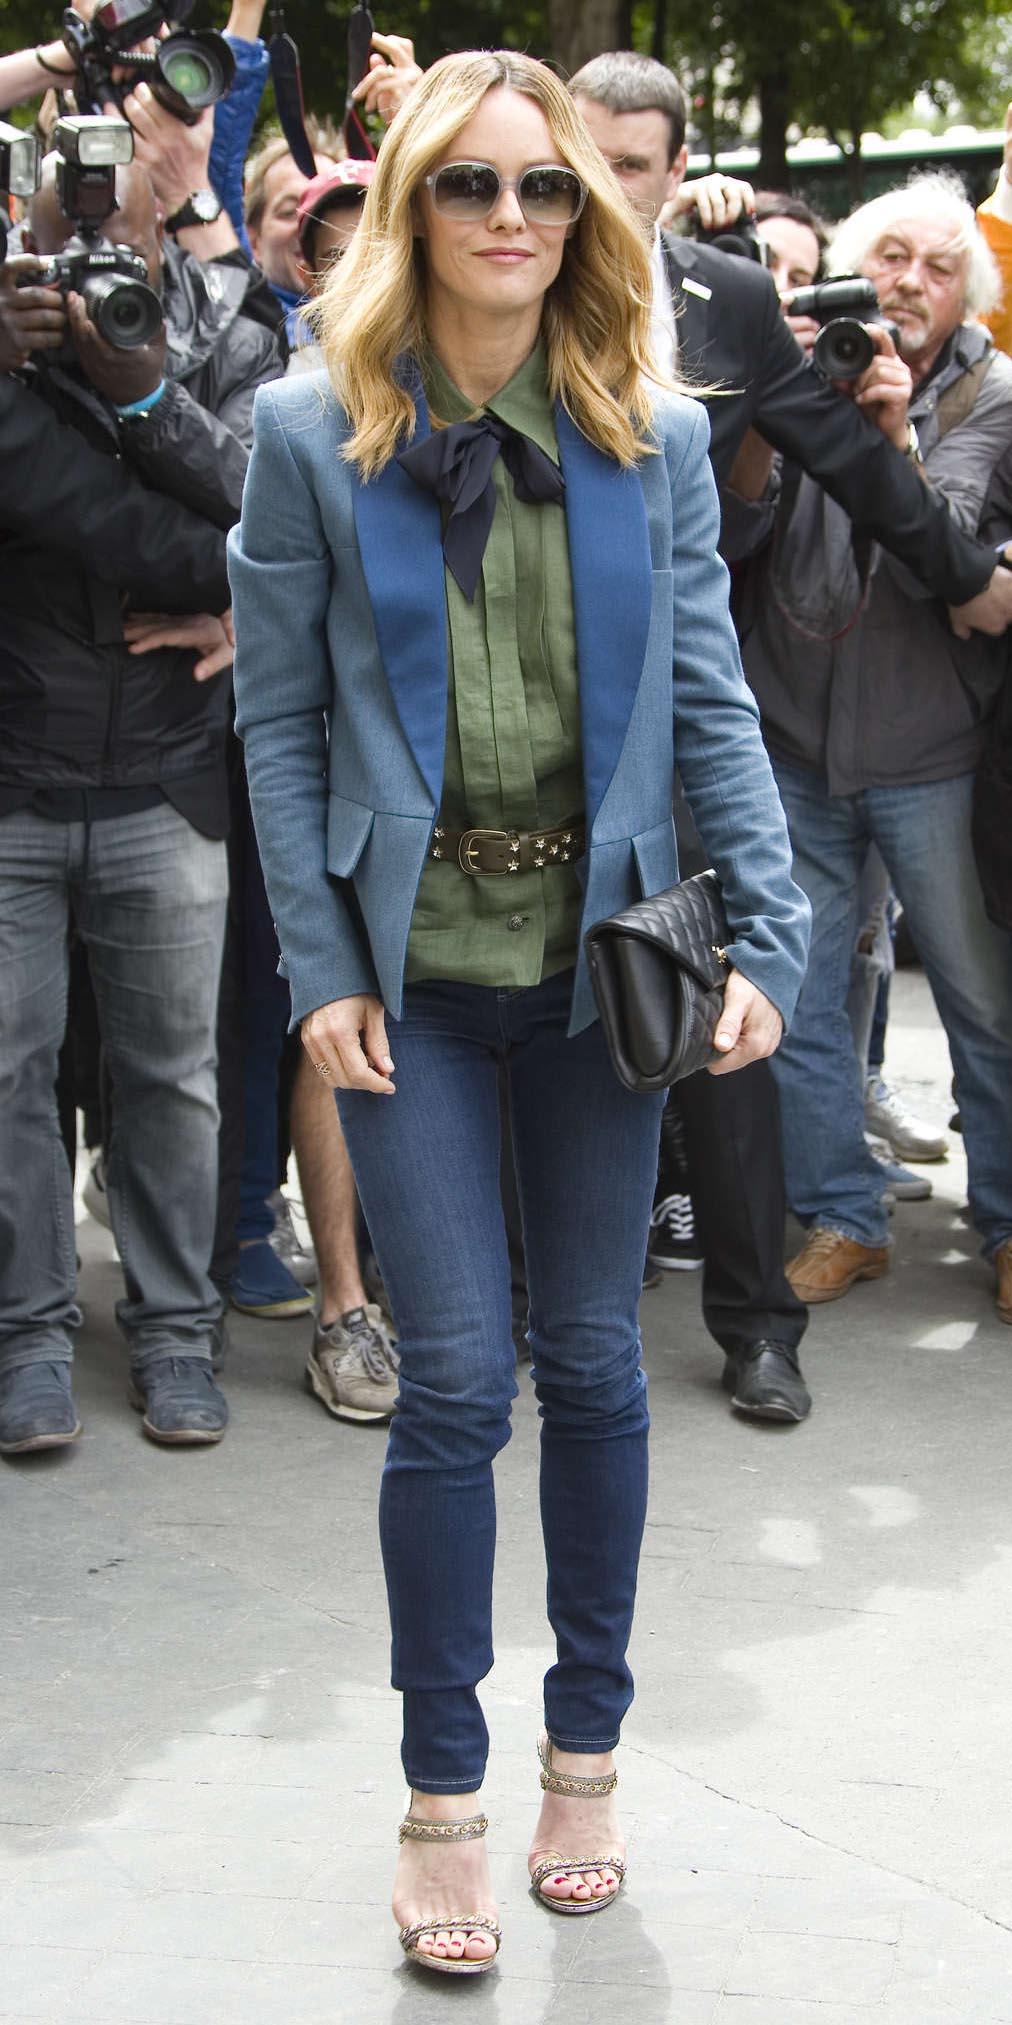 blue-navy-skinny-jeans-green-olive-top-howtowear-style-fashion-spring-summer-blue-med-jacket-blazer-black-bag-clutch-sun-vanessaparadis-chanel-blonde-work.jpg